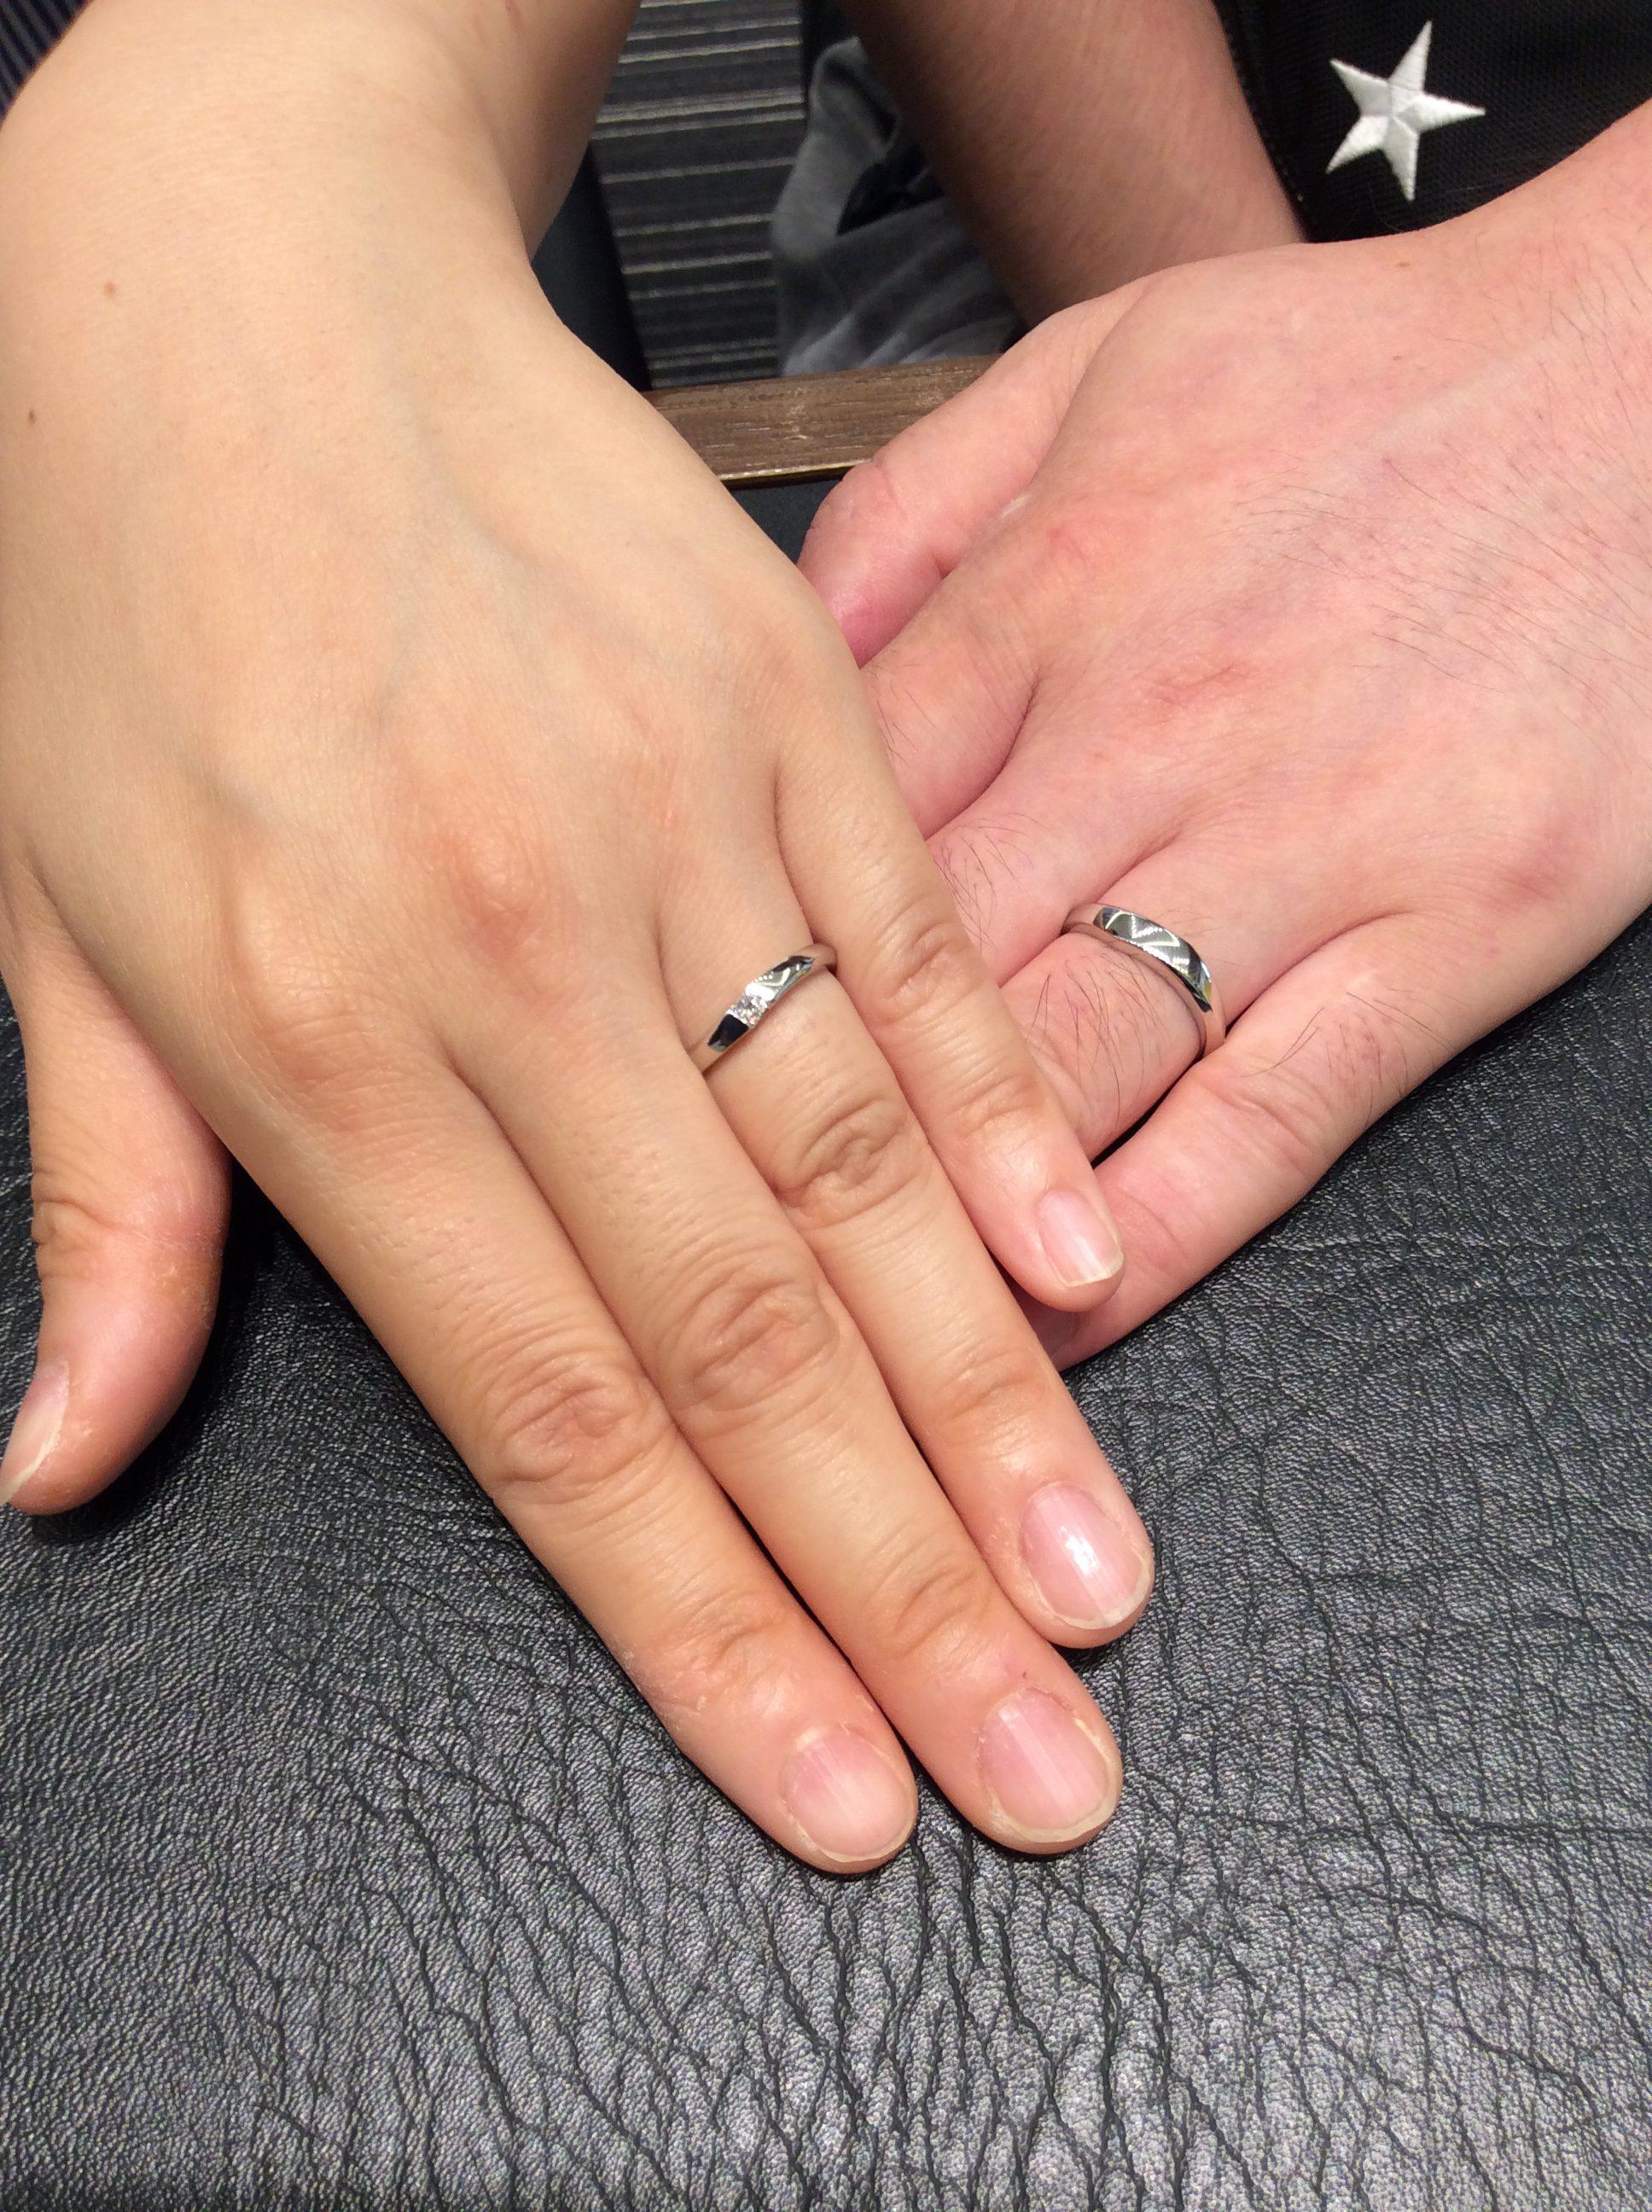 LUCIE(ルシエ)の結婚指輪『ミーティア』をご成約(新潟市/倉田健吾様・栞様)